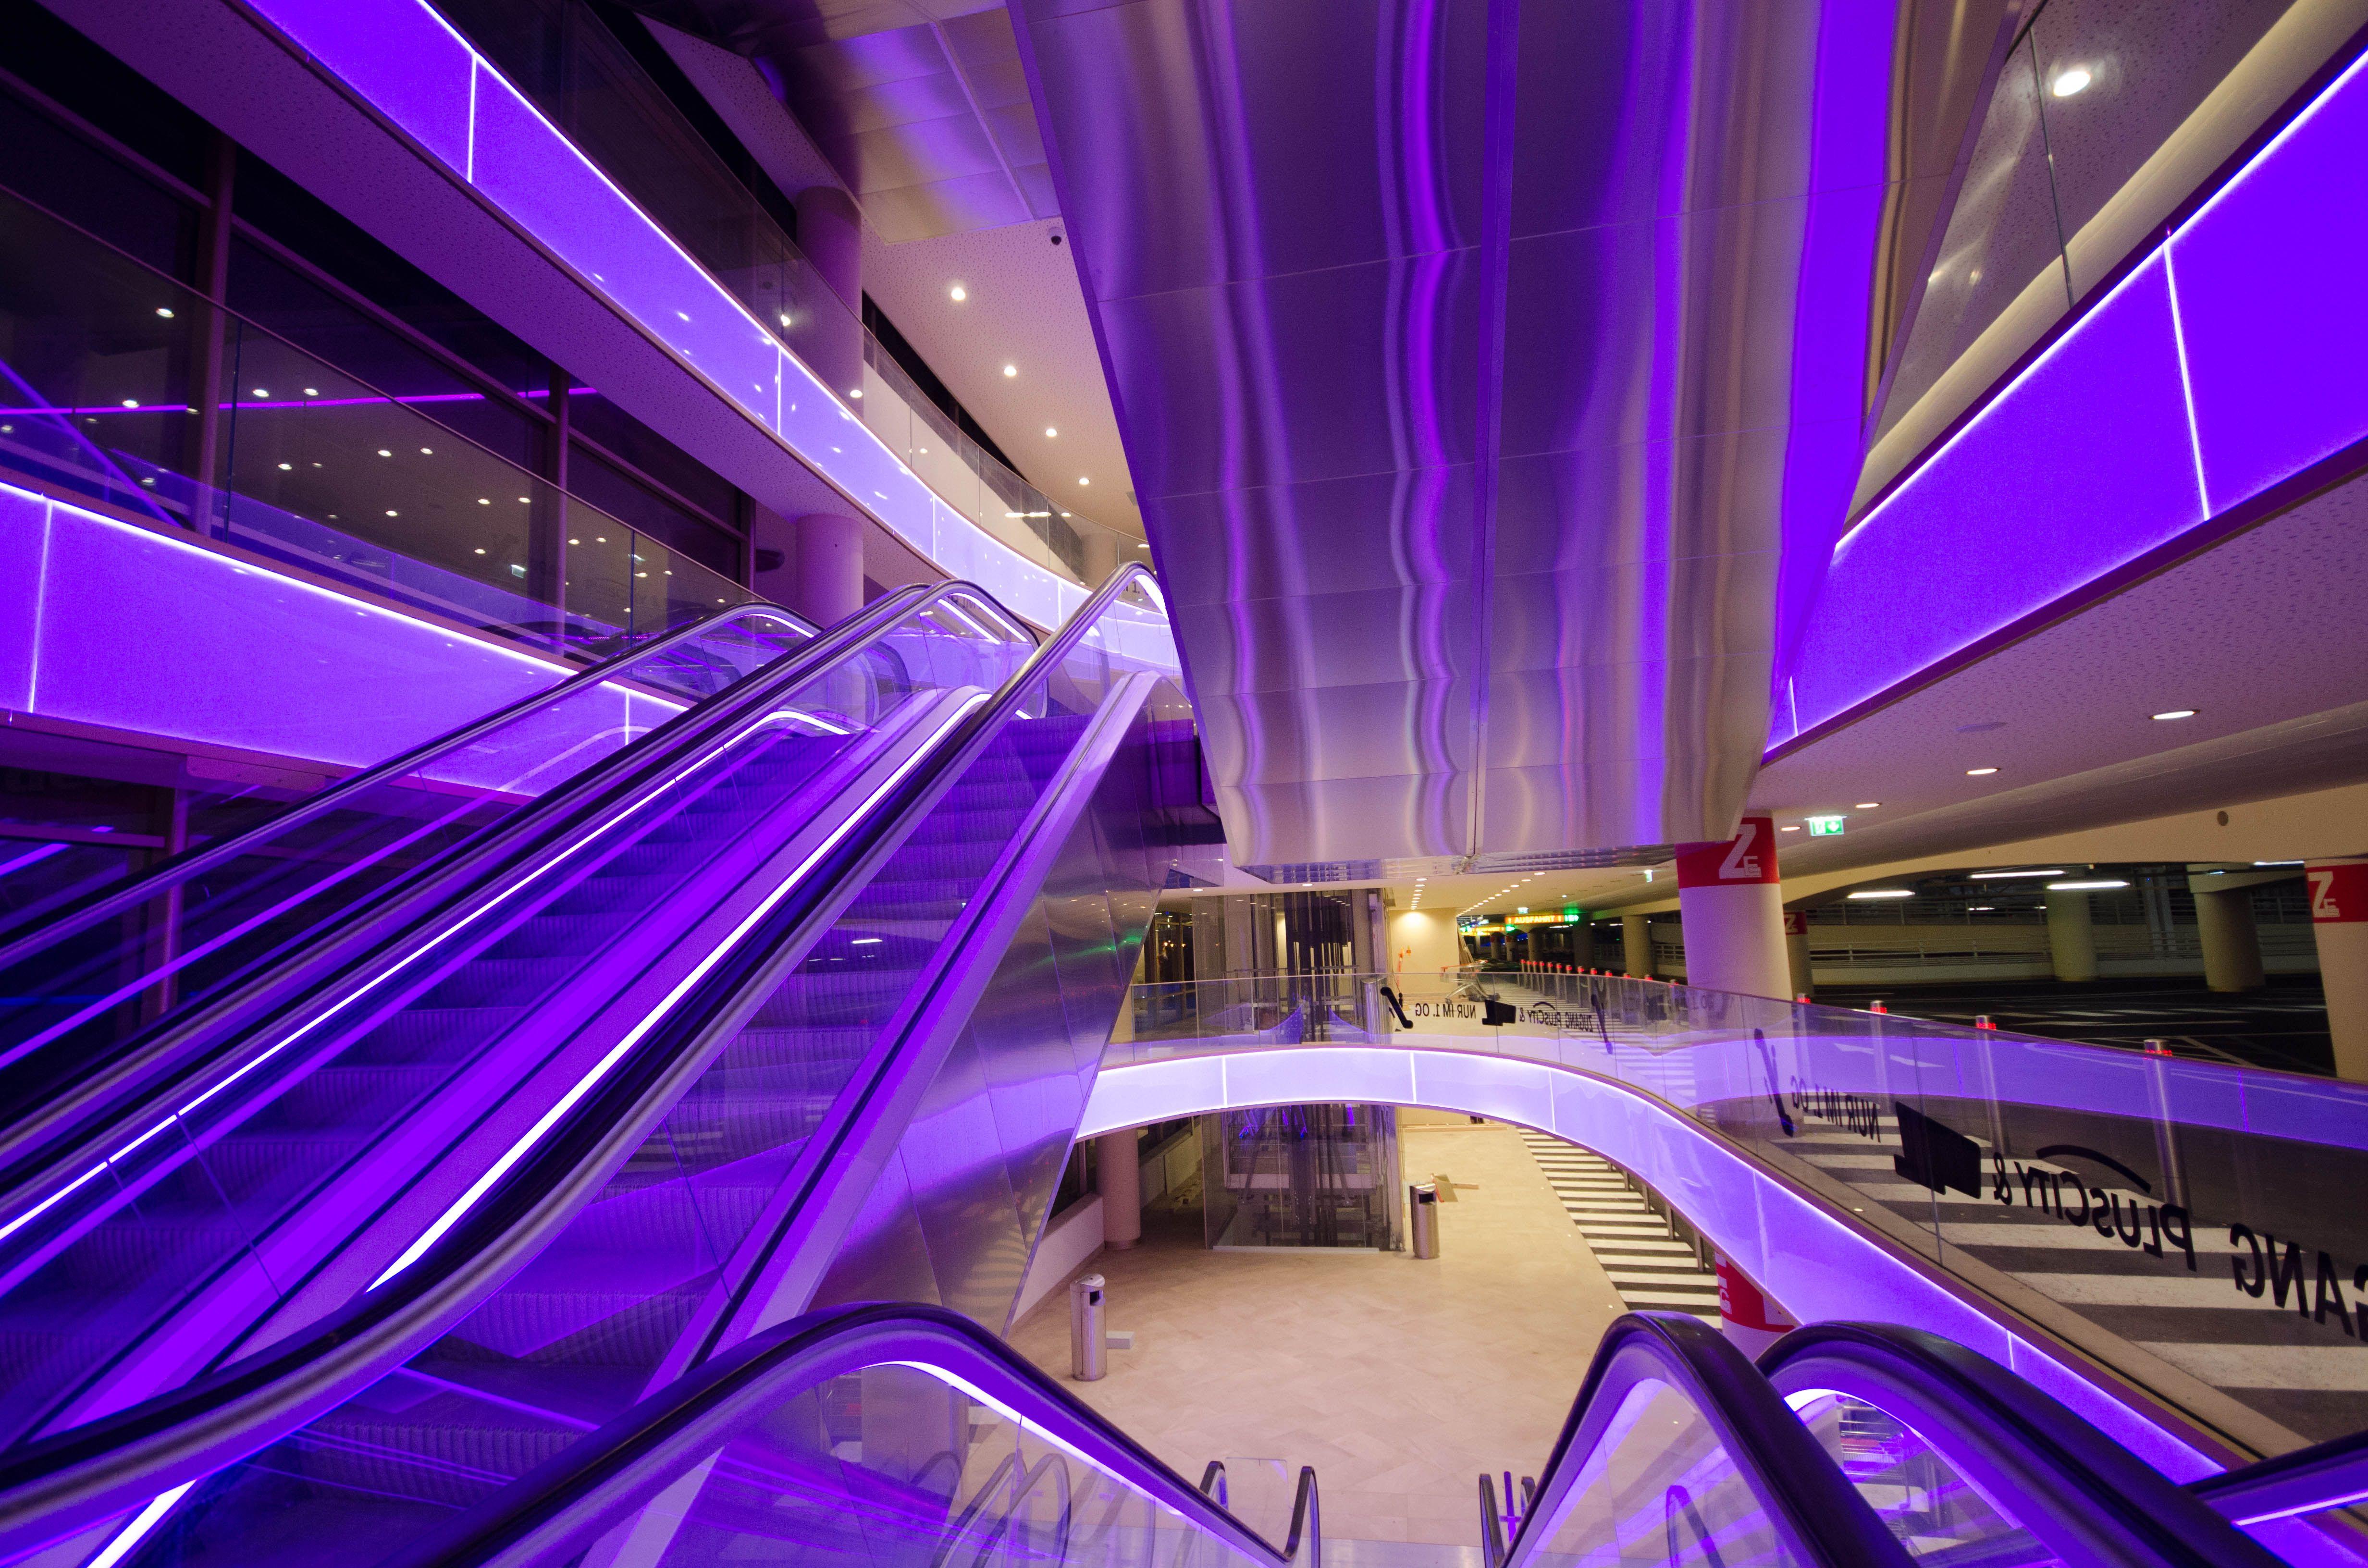 Led Strips Lights 10m Tehwaaz 32 8ft Rgb Led Rope Lights With 20 Keys Ir Remote Controller And Ap Deckenleuchte Mit Fernbedienung Led Deckenleuchte Led Stripes